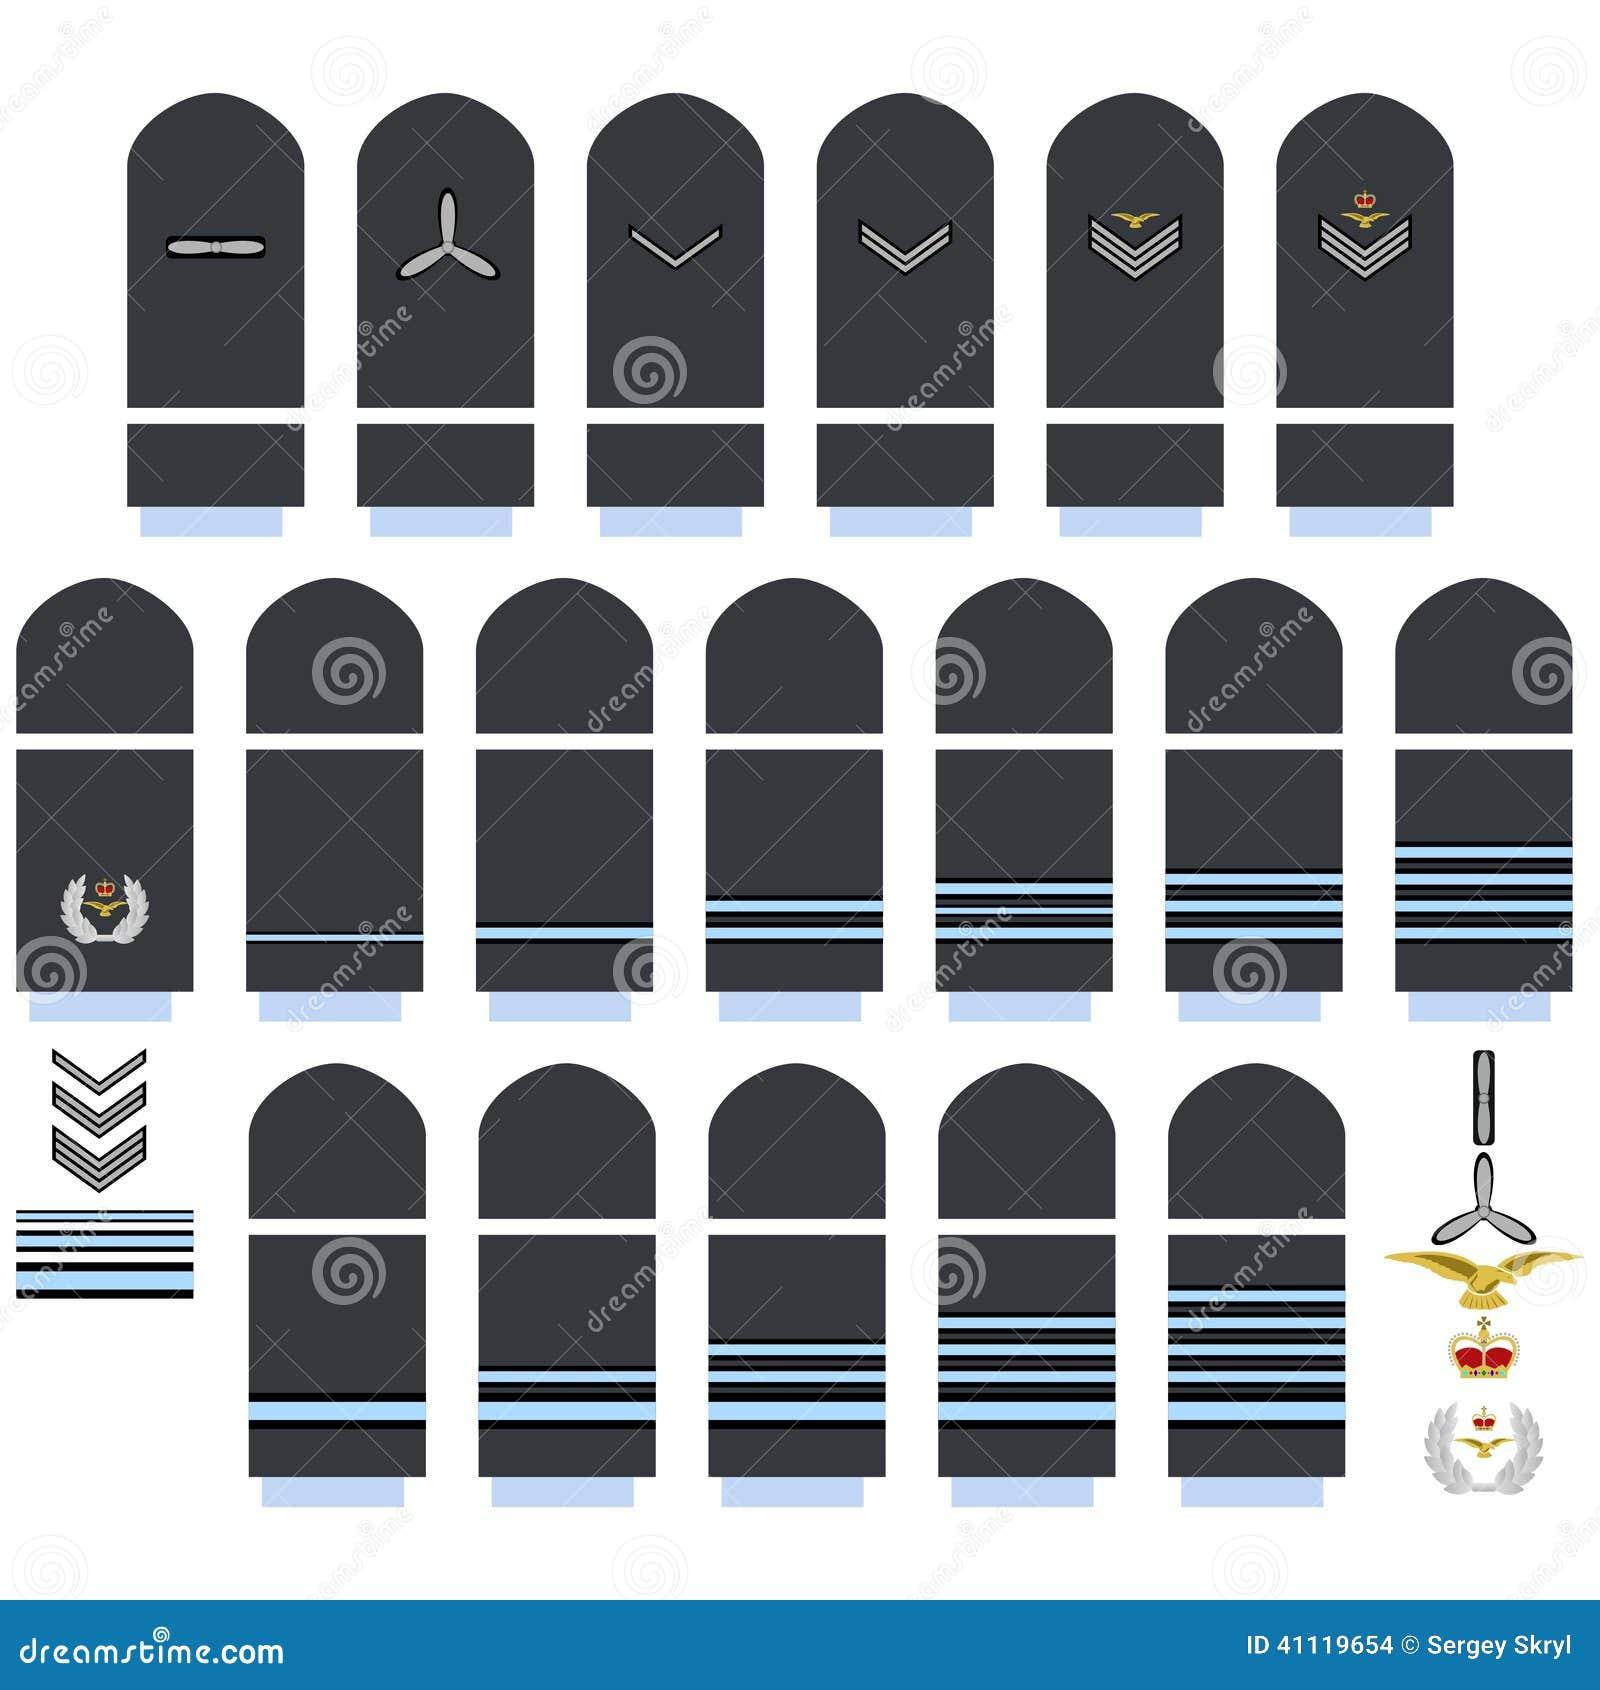 Air Force Ranks